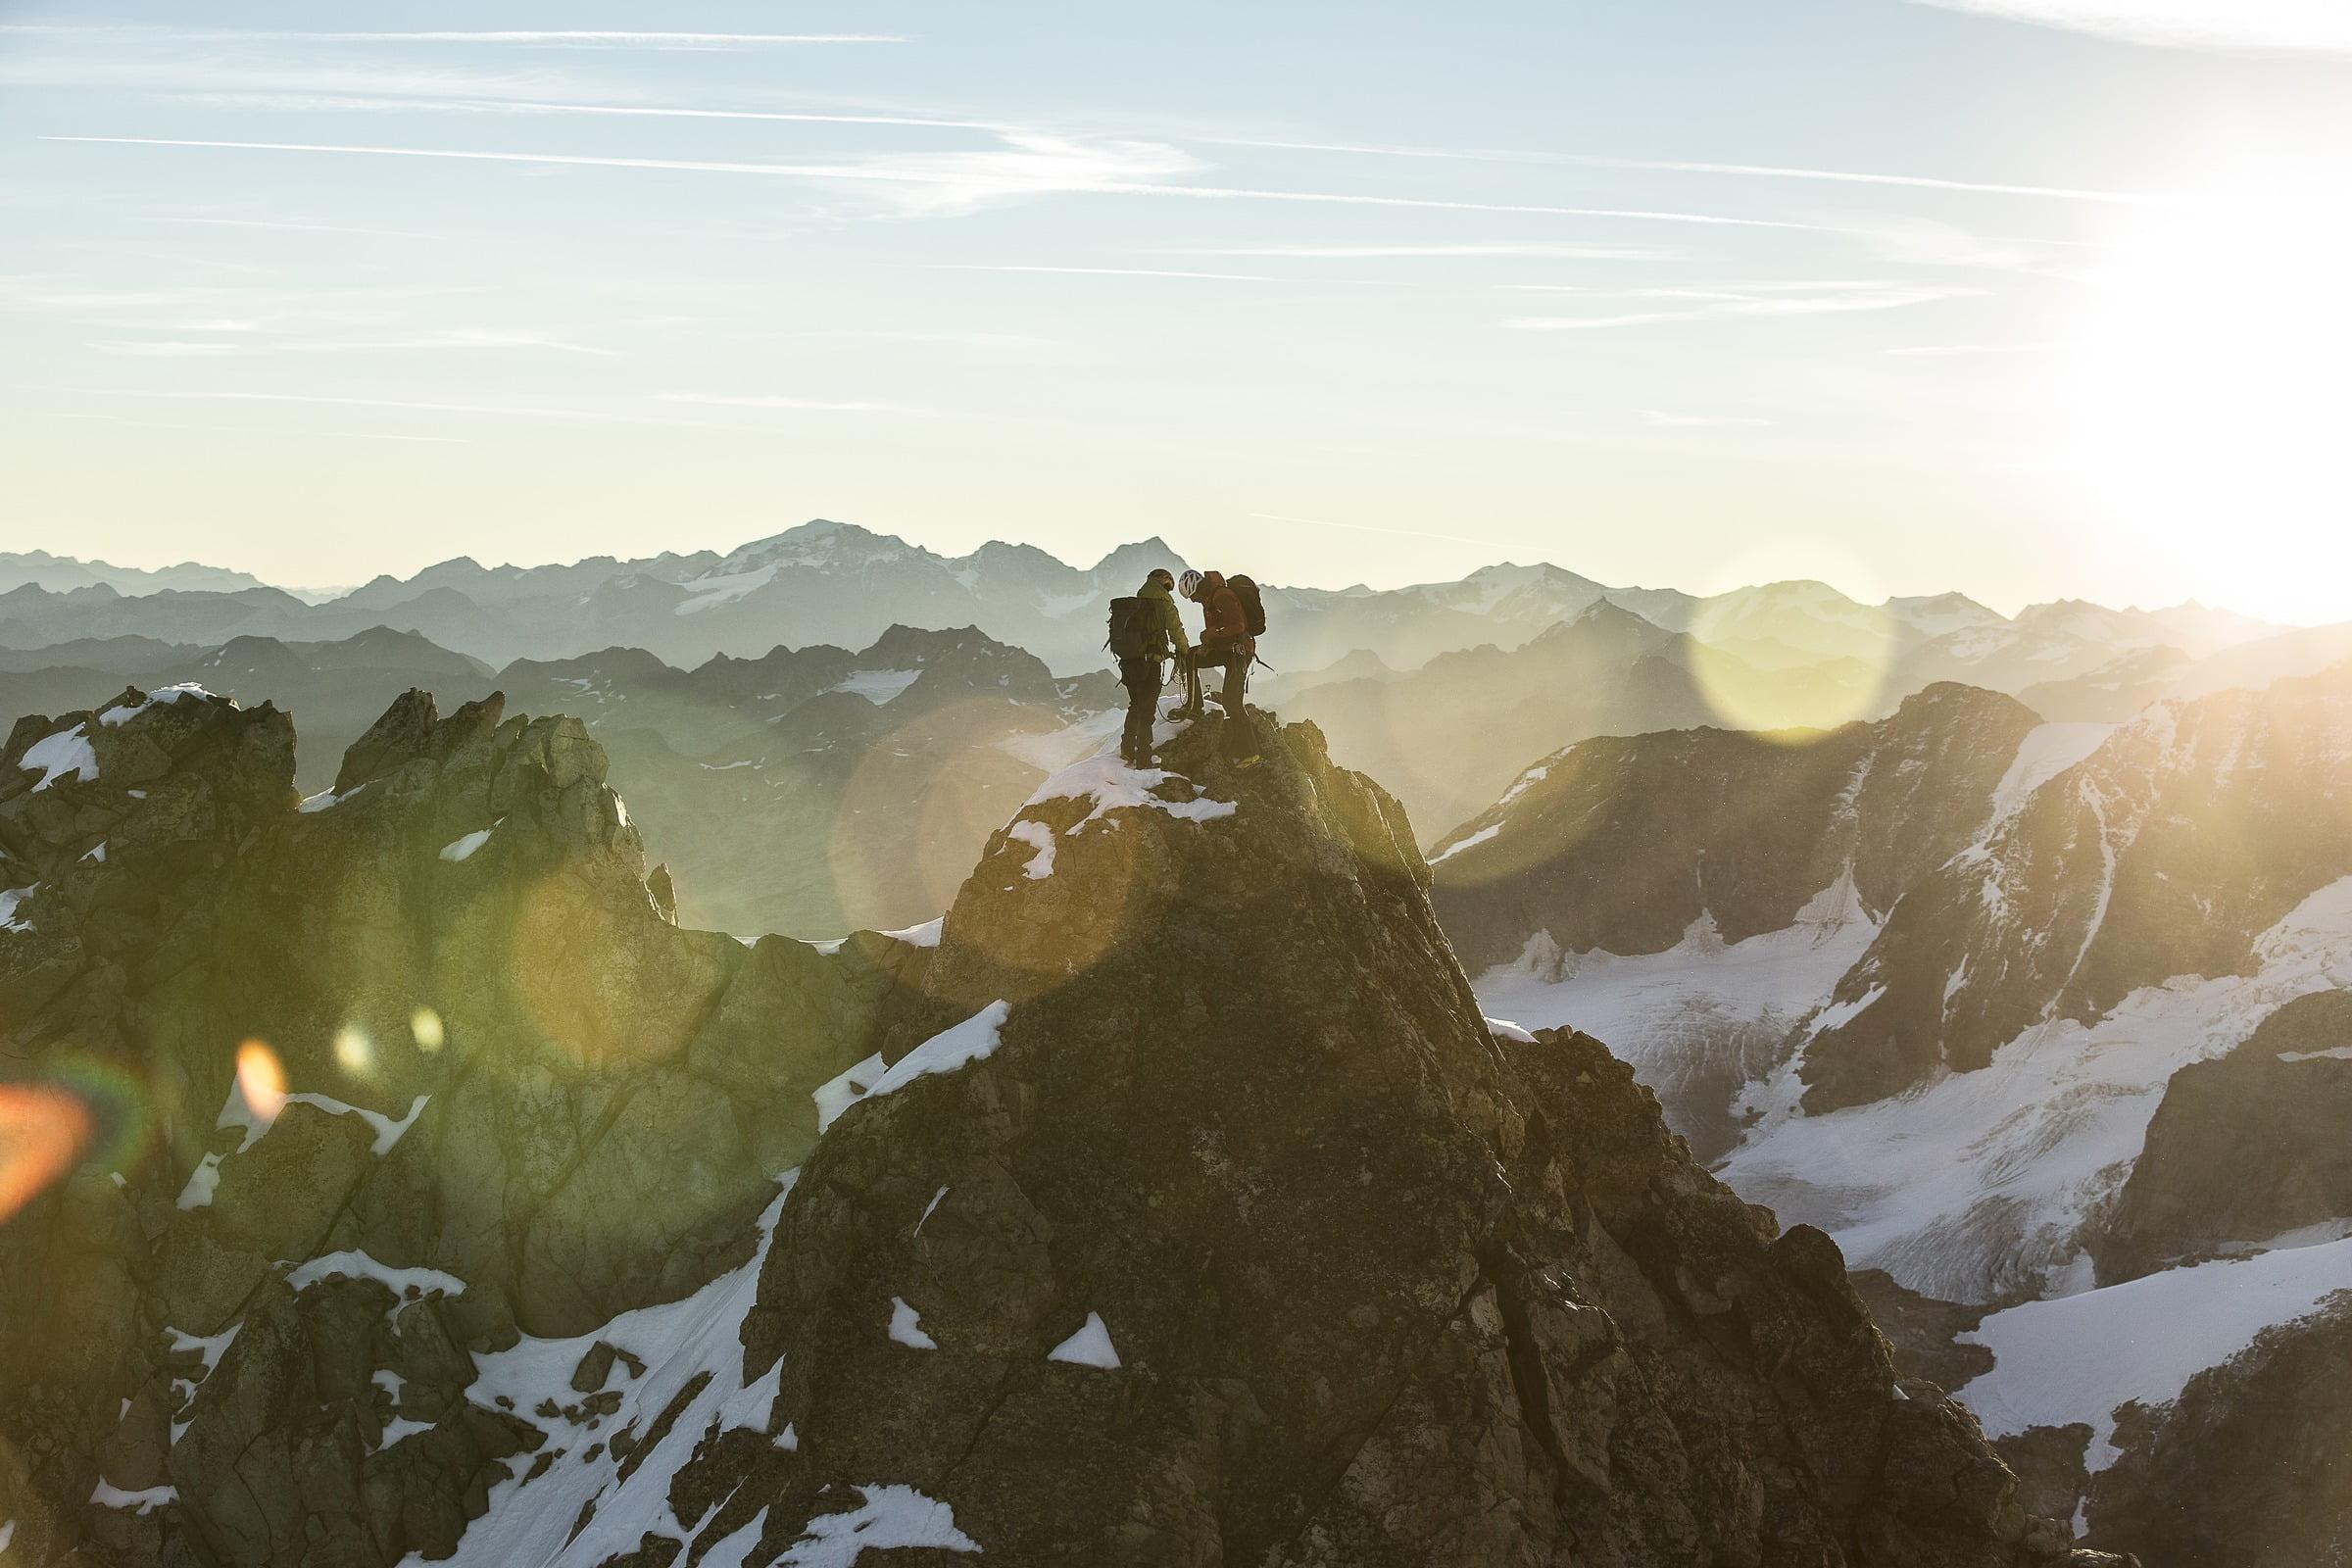 Besteigung des Piz Bernina 4049 m